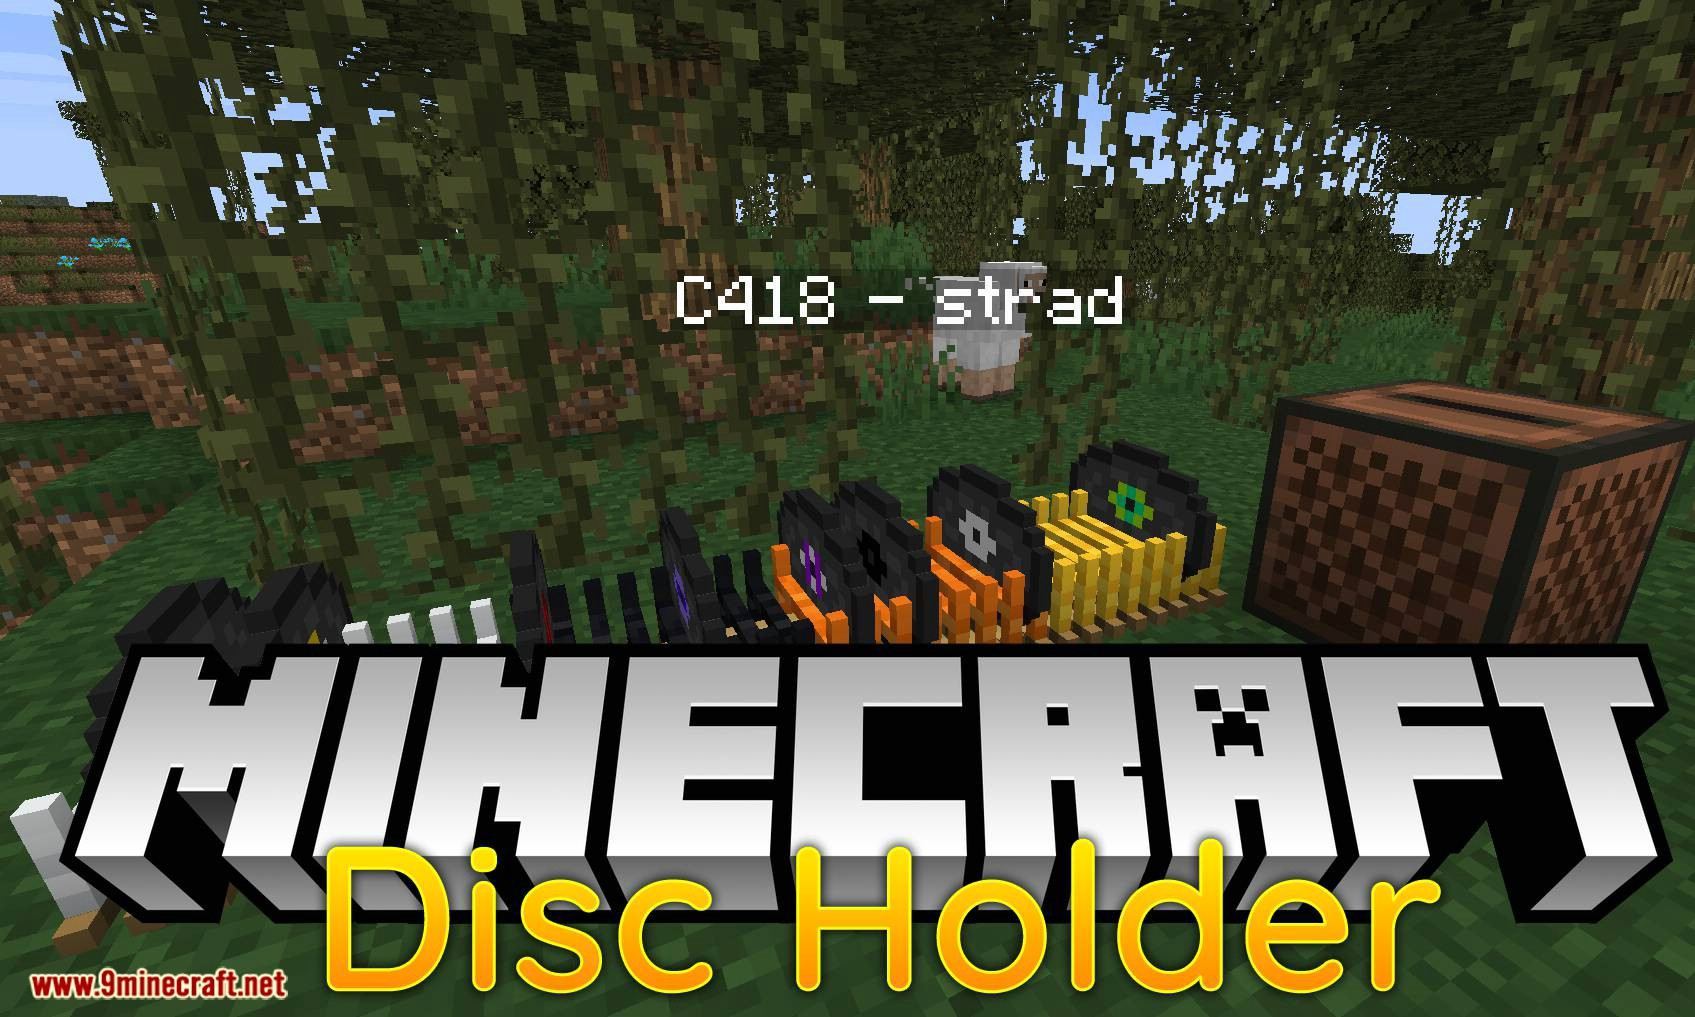 Disc Holder mod for minecraft logo